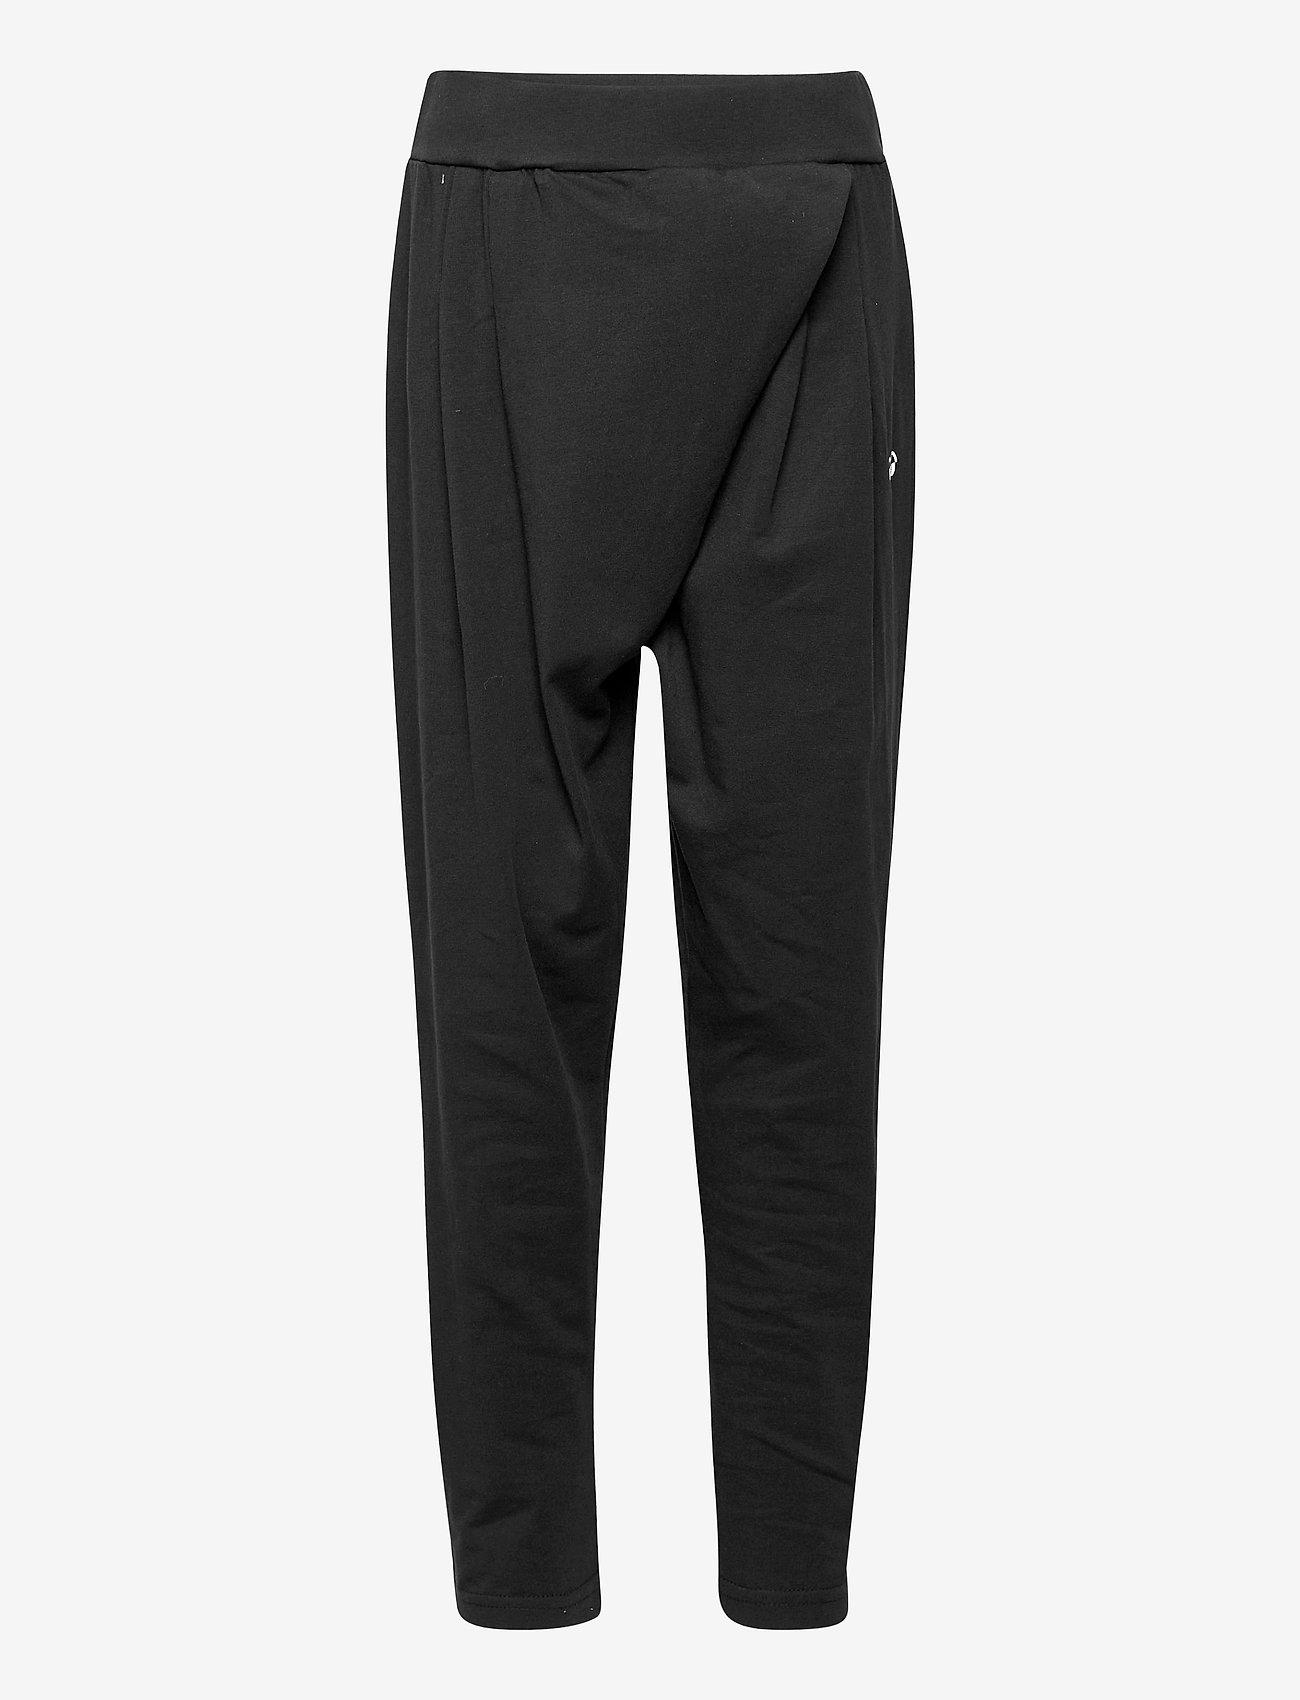 Hummel - hmlANDREA PANTS - trousers - black - 0